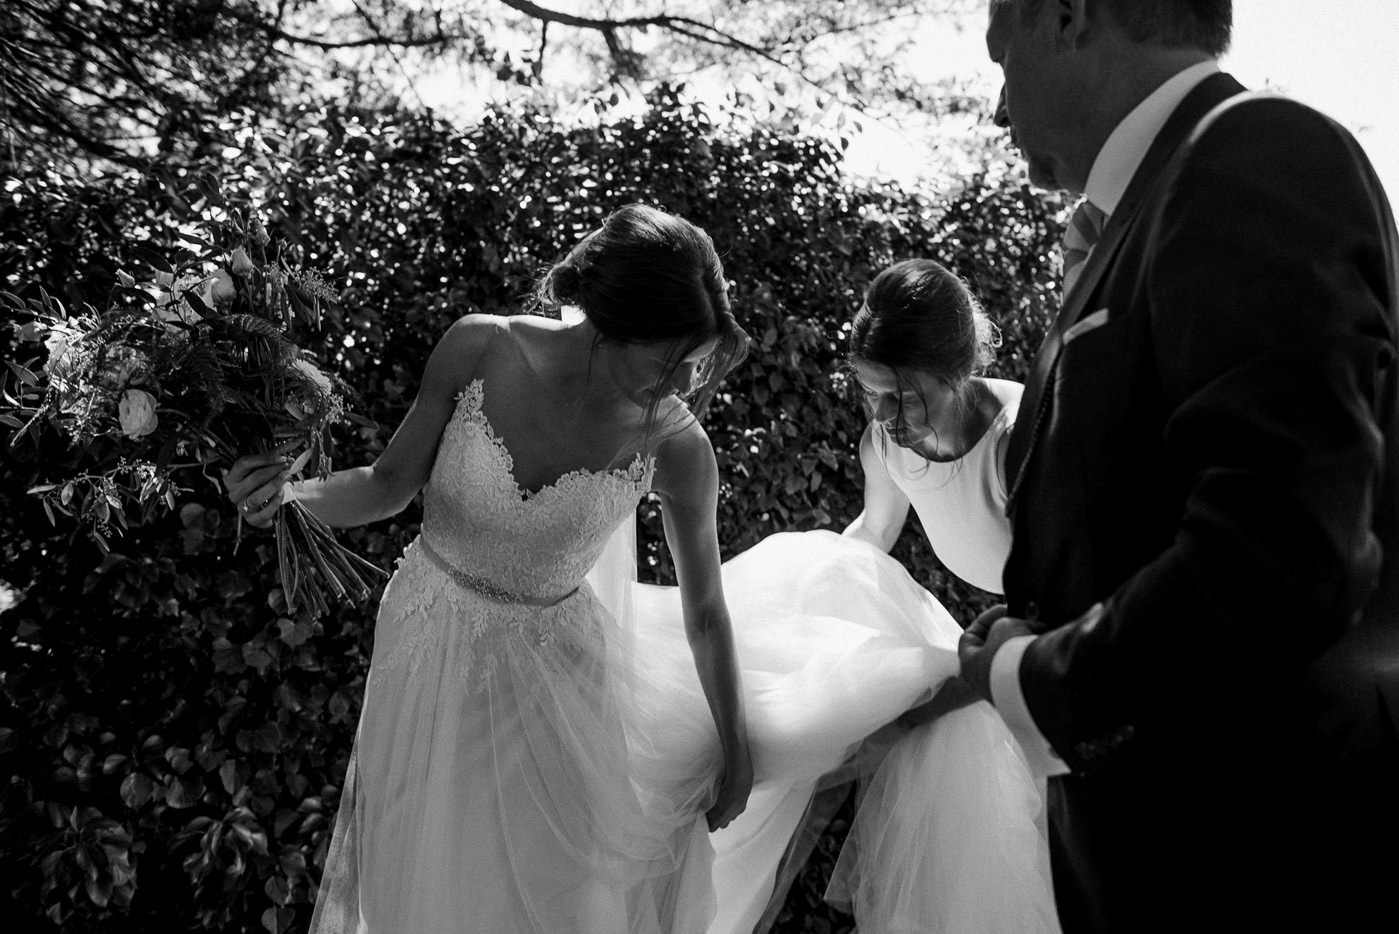 wedding photographer london timings on wedding day